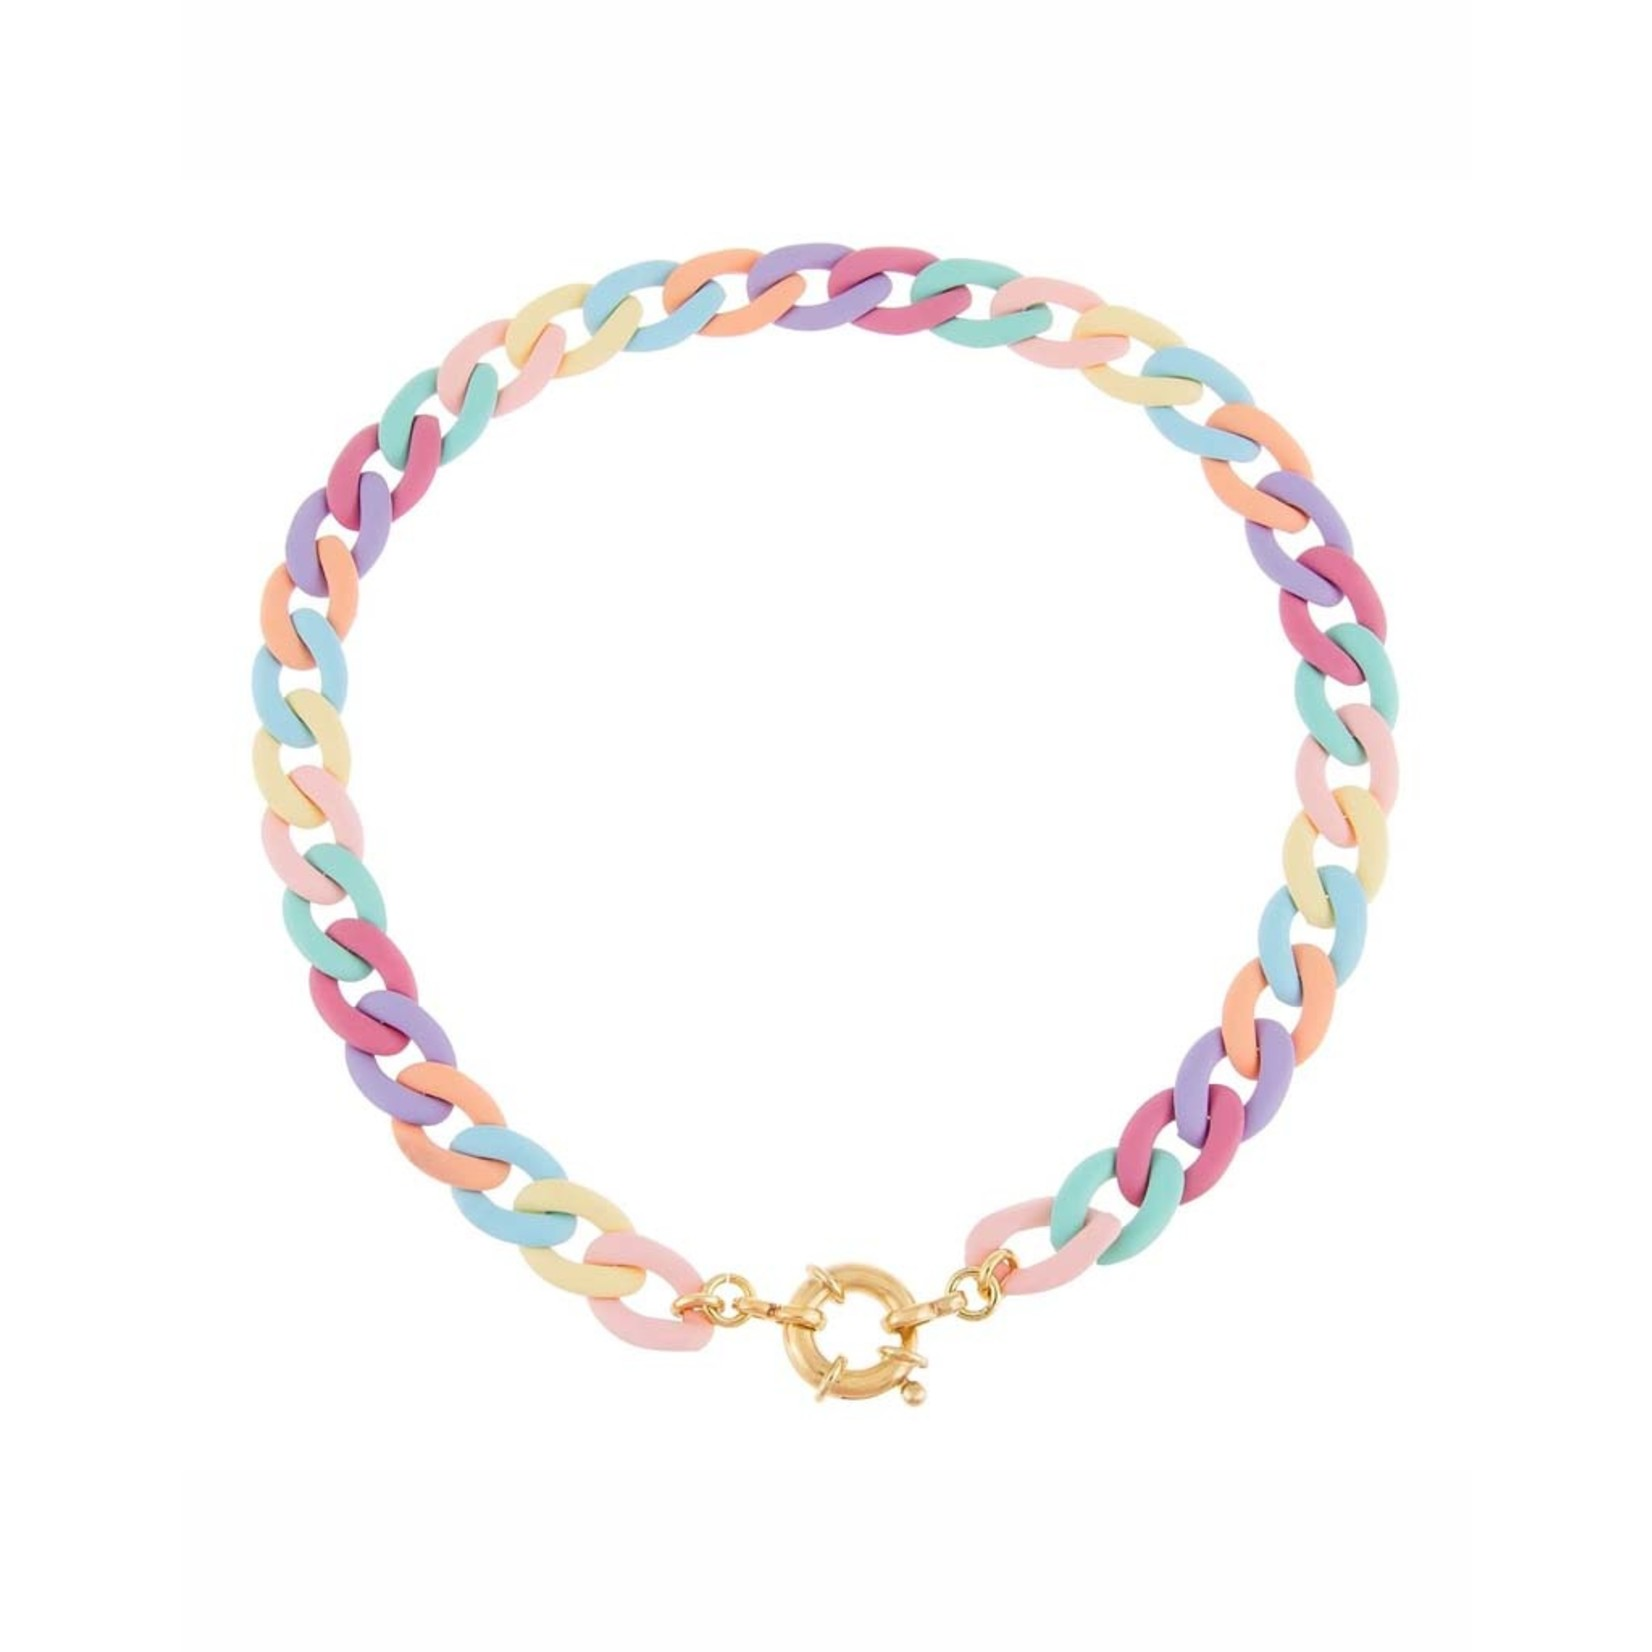 Adinas Pastel Colored Chain Link Toggle Choker